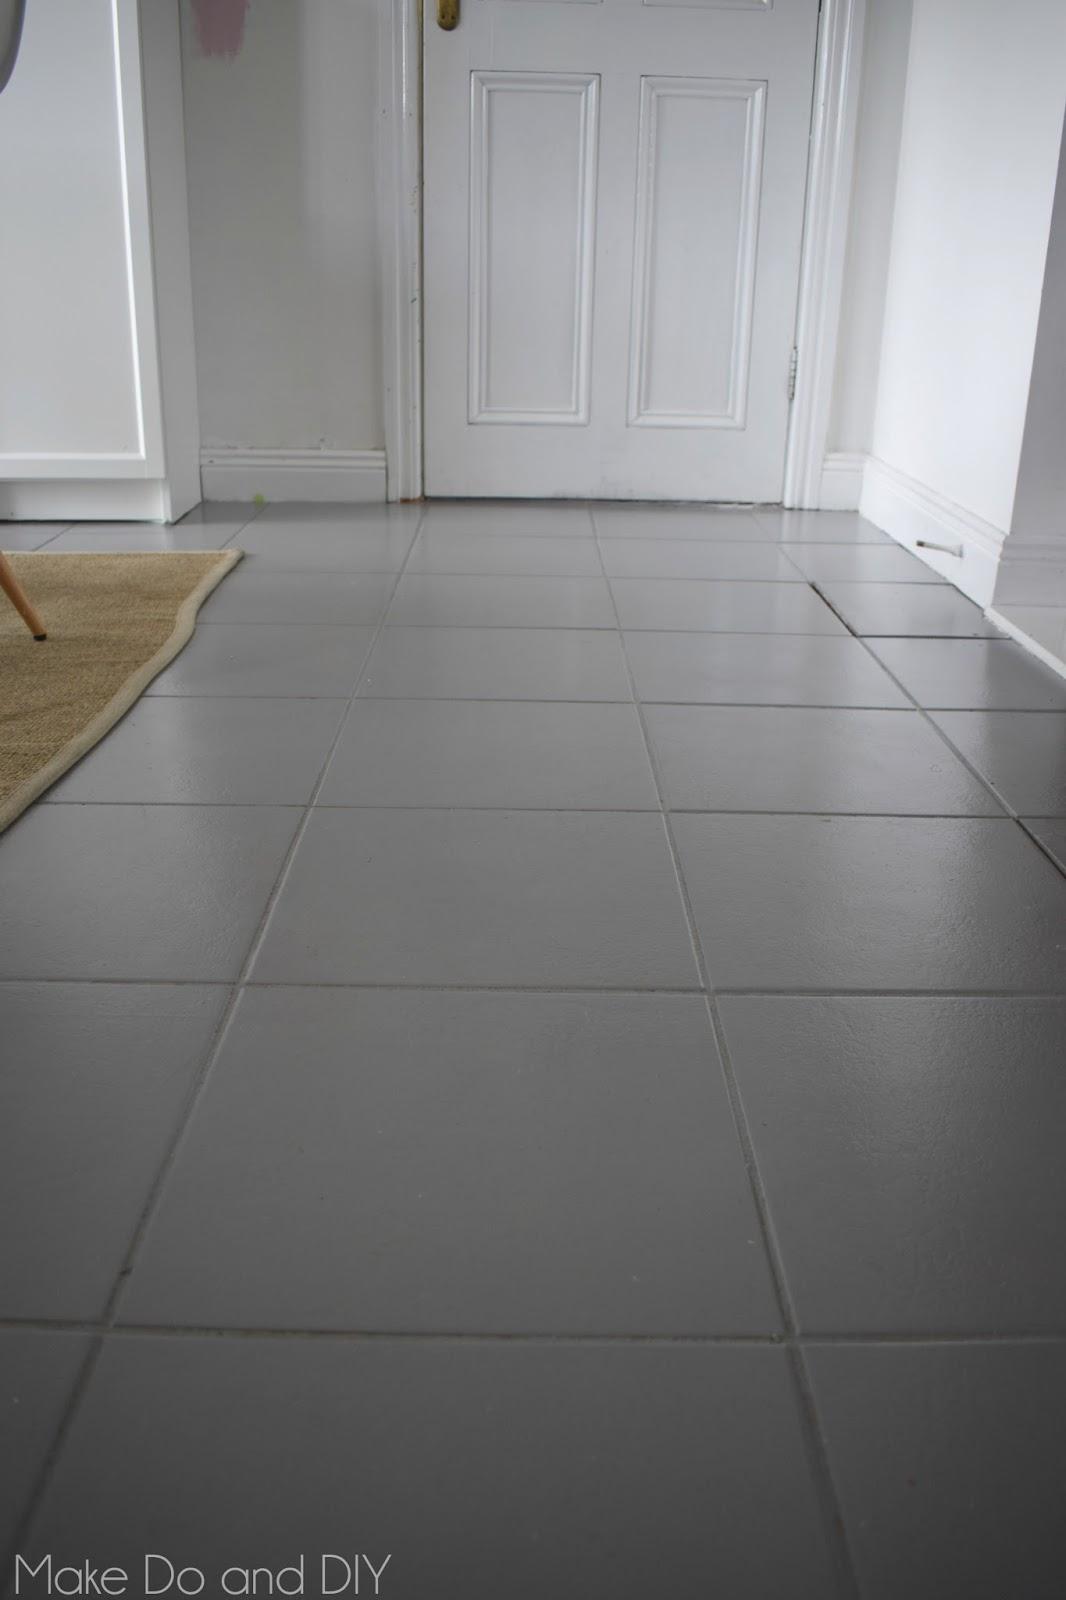 Painting Old Tile Floors | Tile Design Ideas